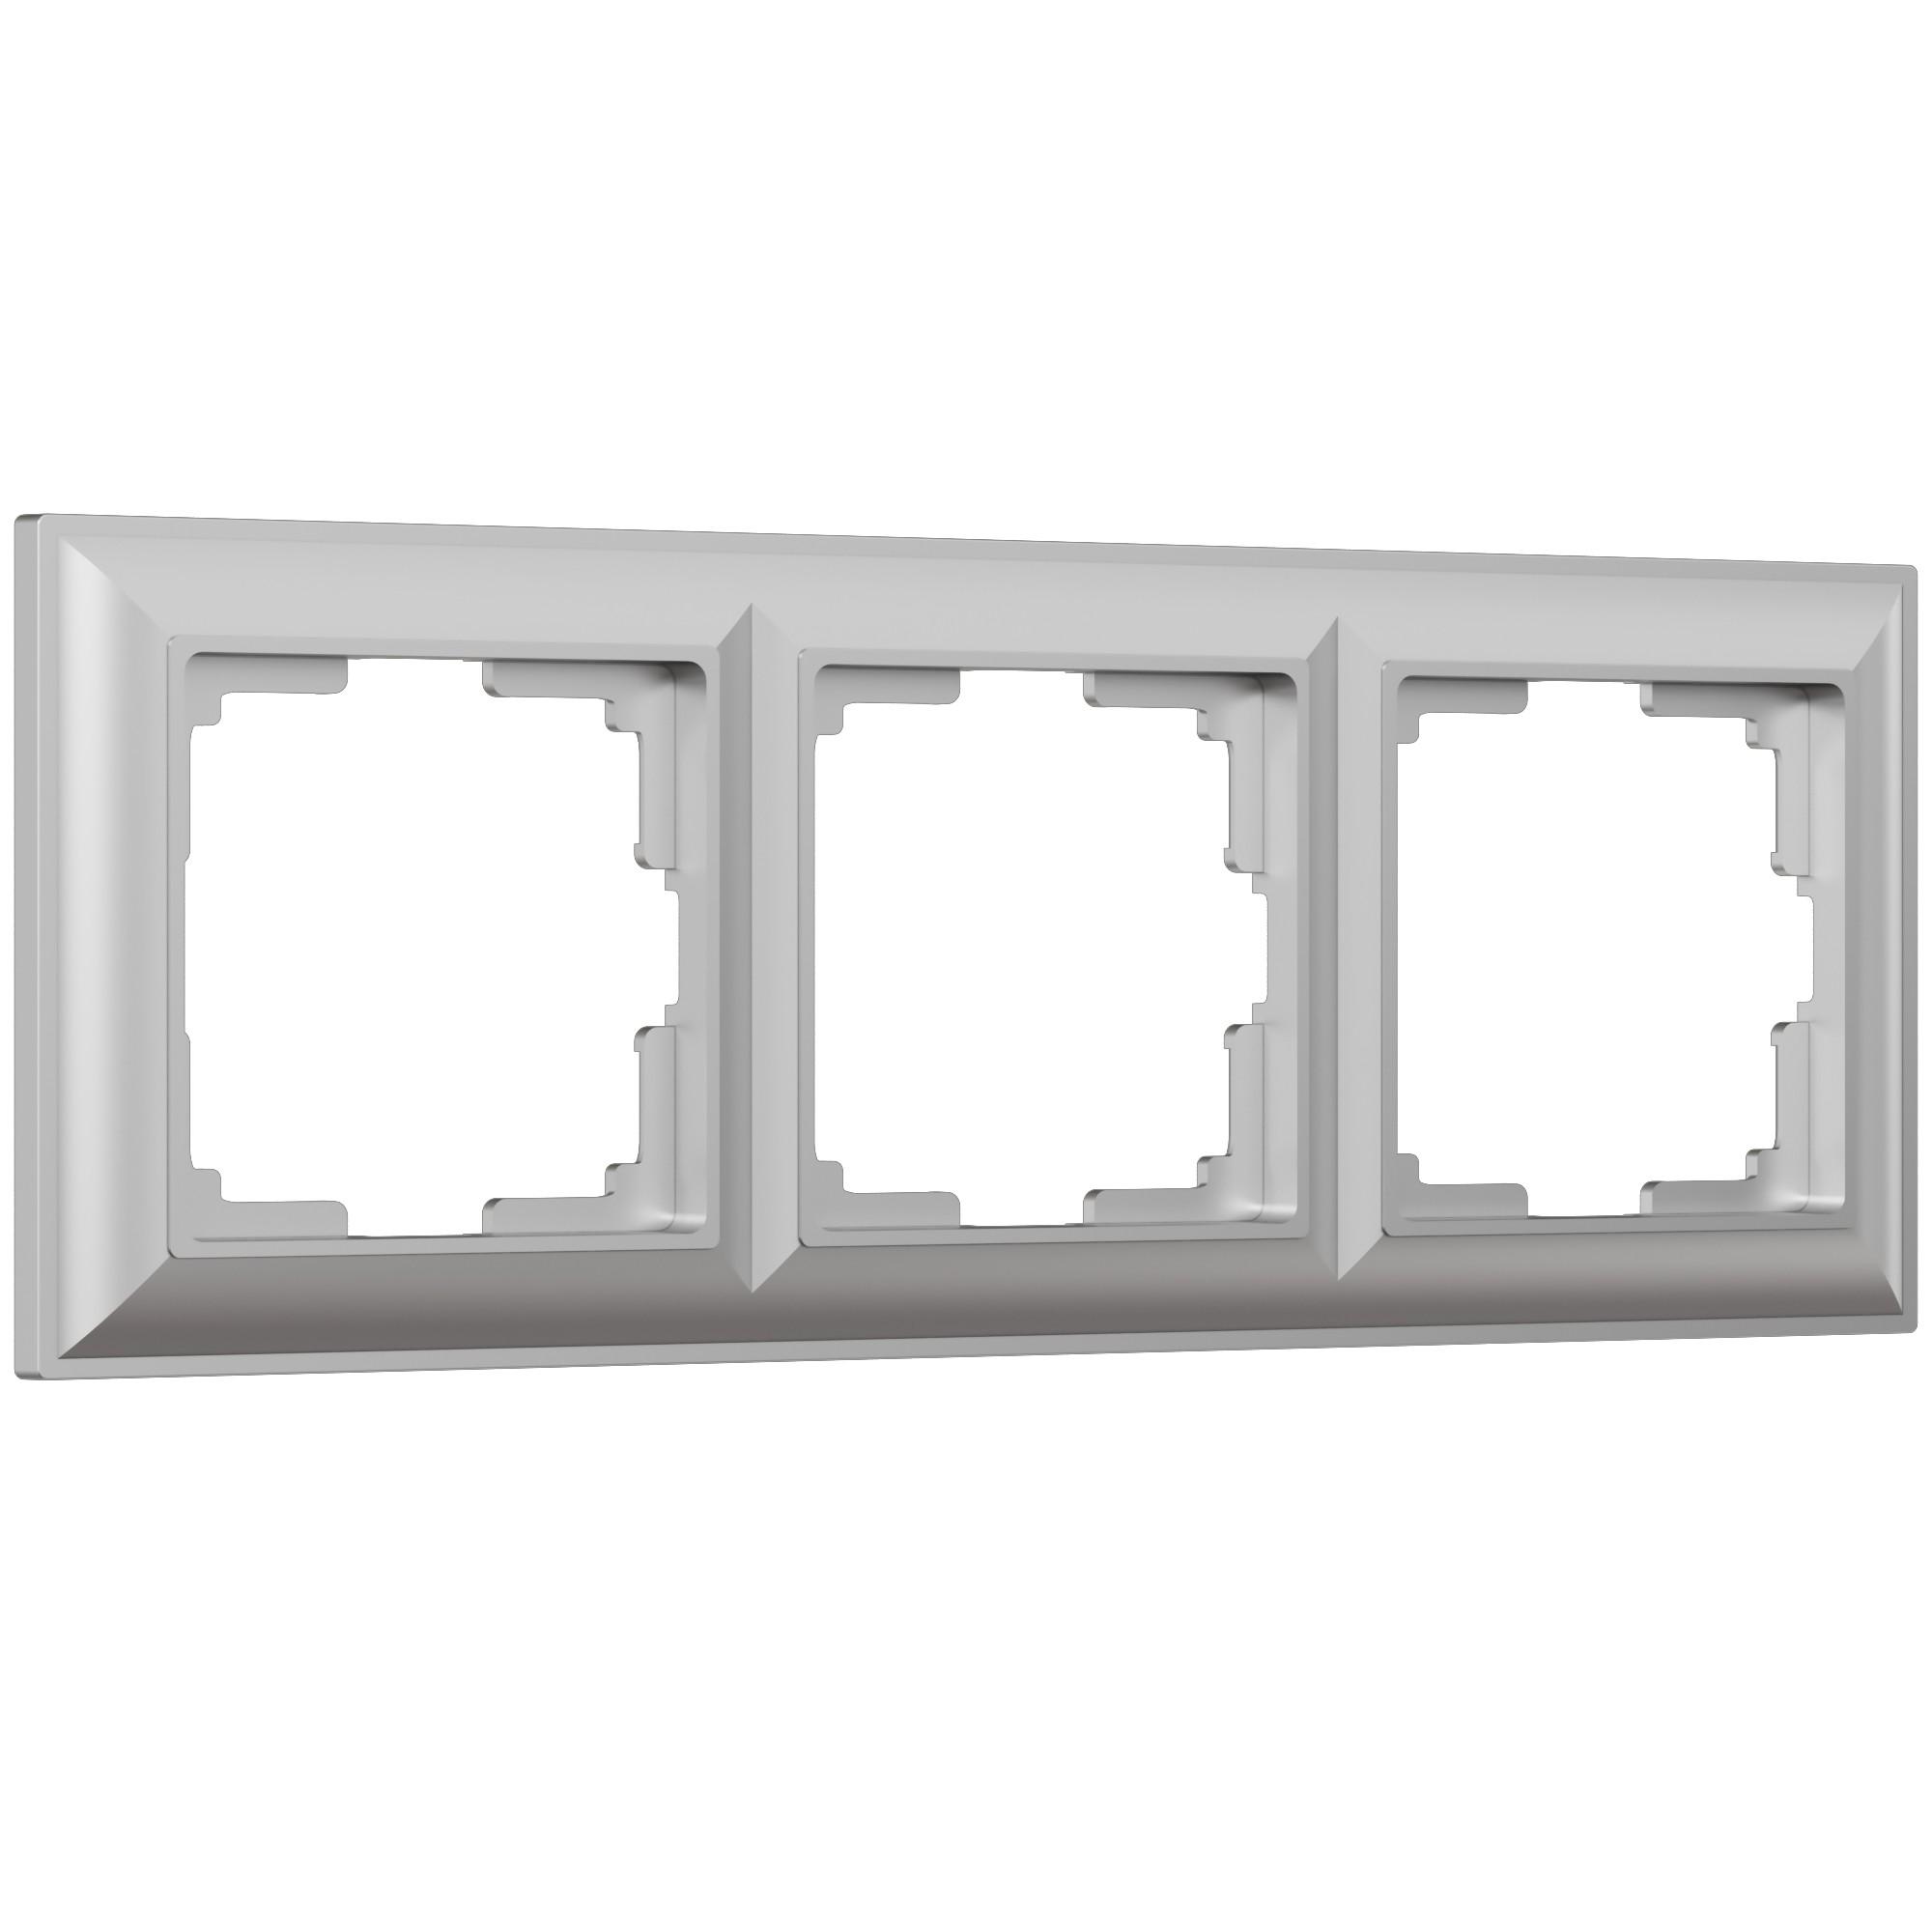 WL14-Frame-03/ Рамка на 3 поста (серебряный)